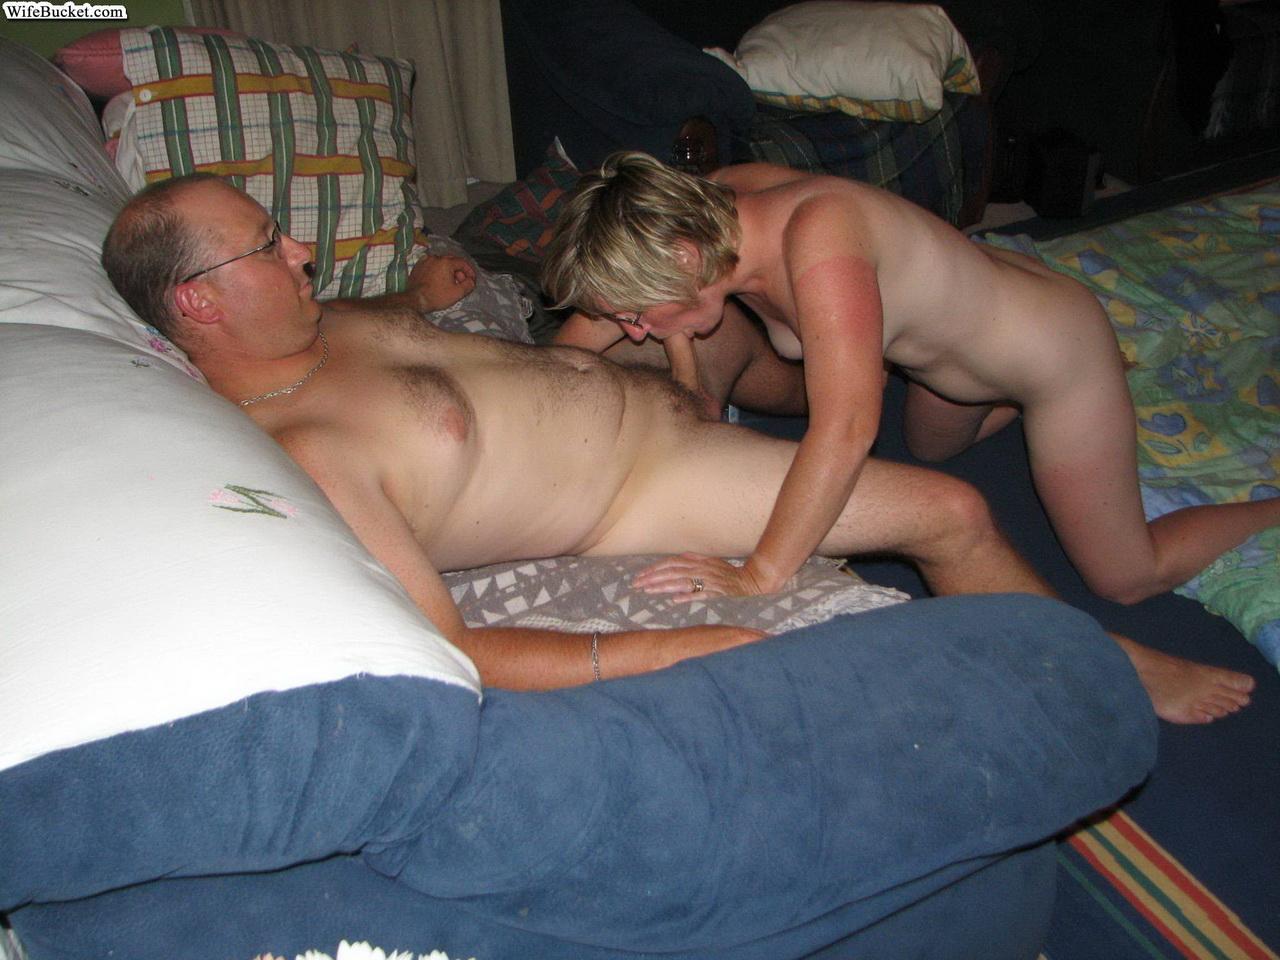 Amateur Wife Sucking Strangers